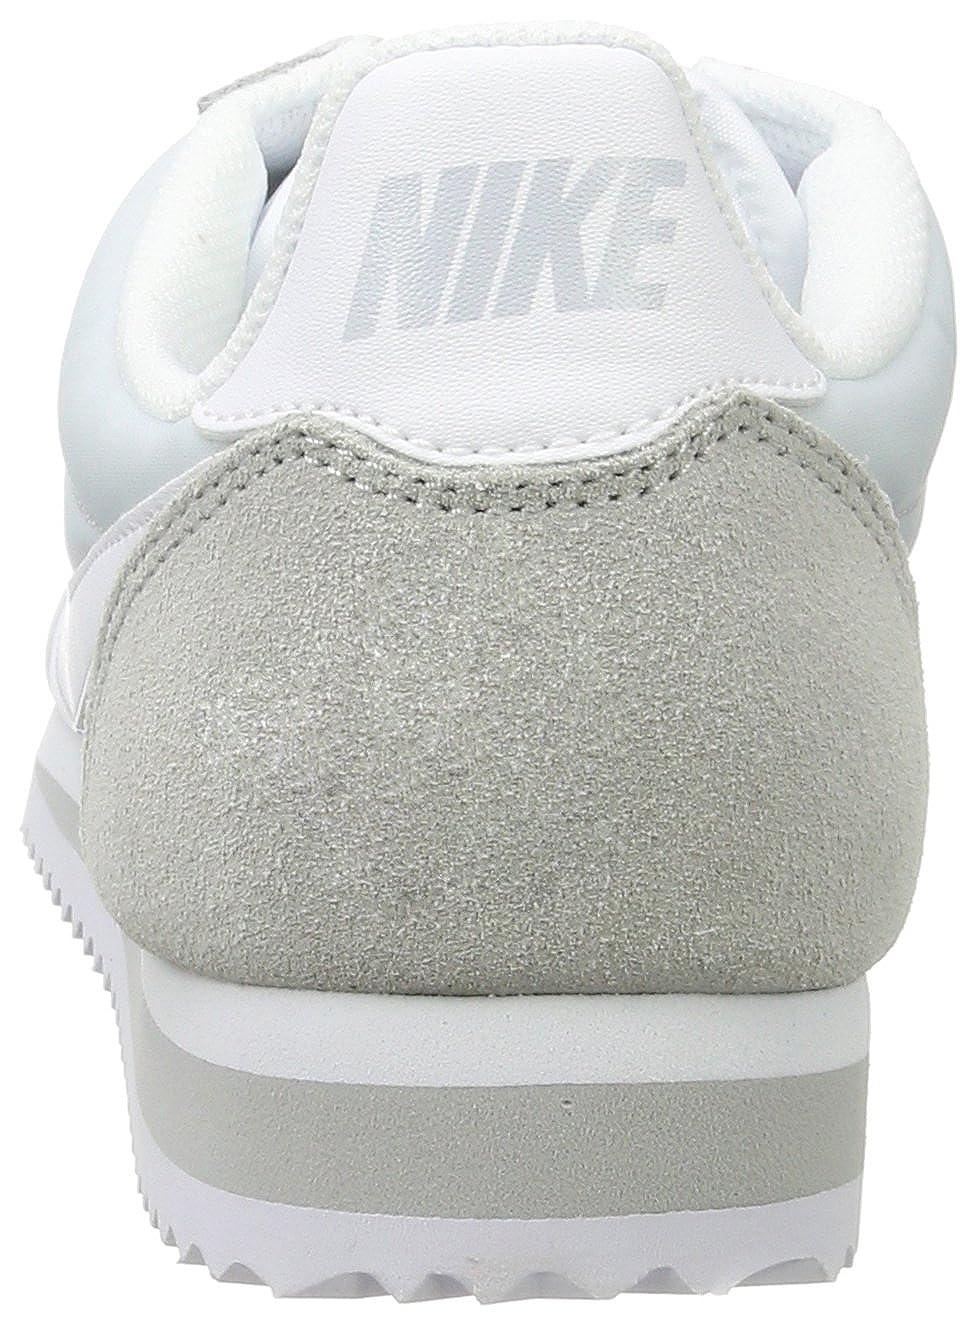 Nike Damen WMNS Classic Cortez Nylon Laufschuhe Laufschuhe Laufschuhe Eisfarben b346b5